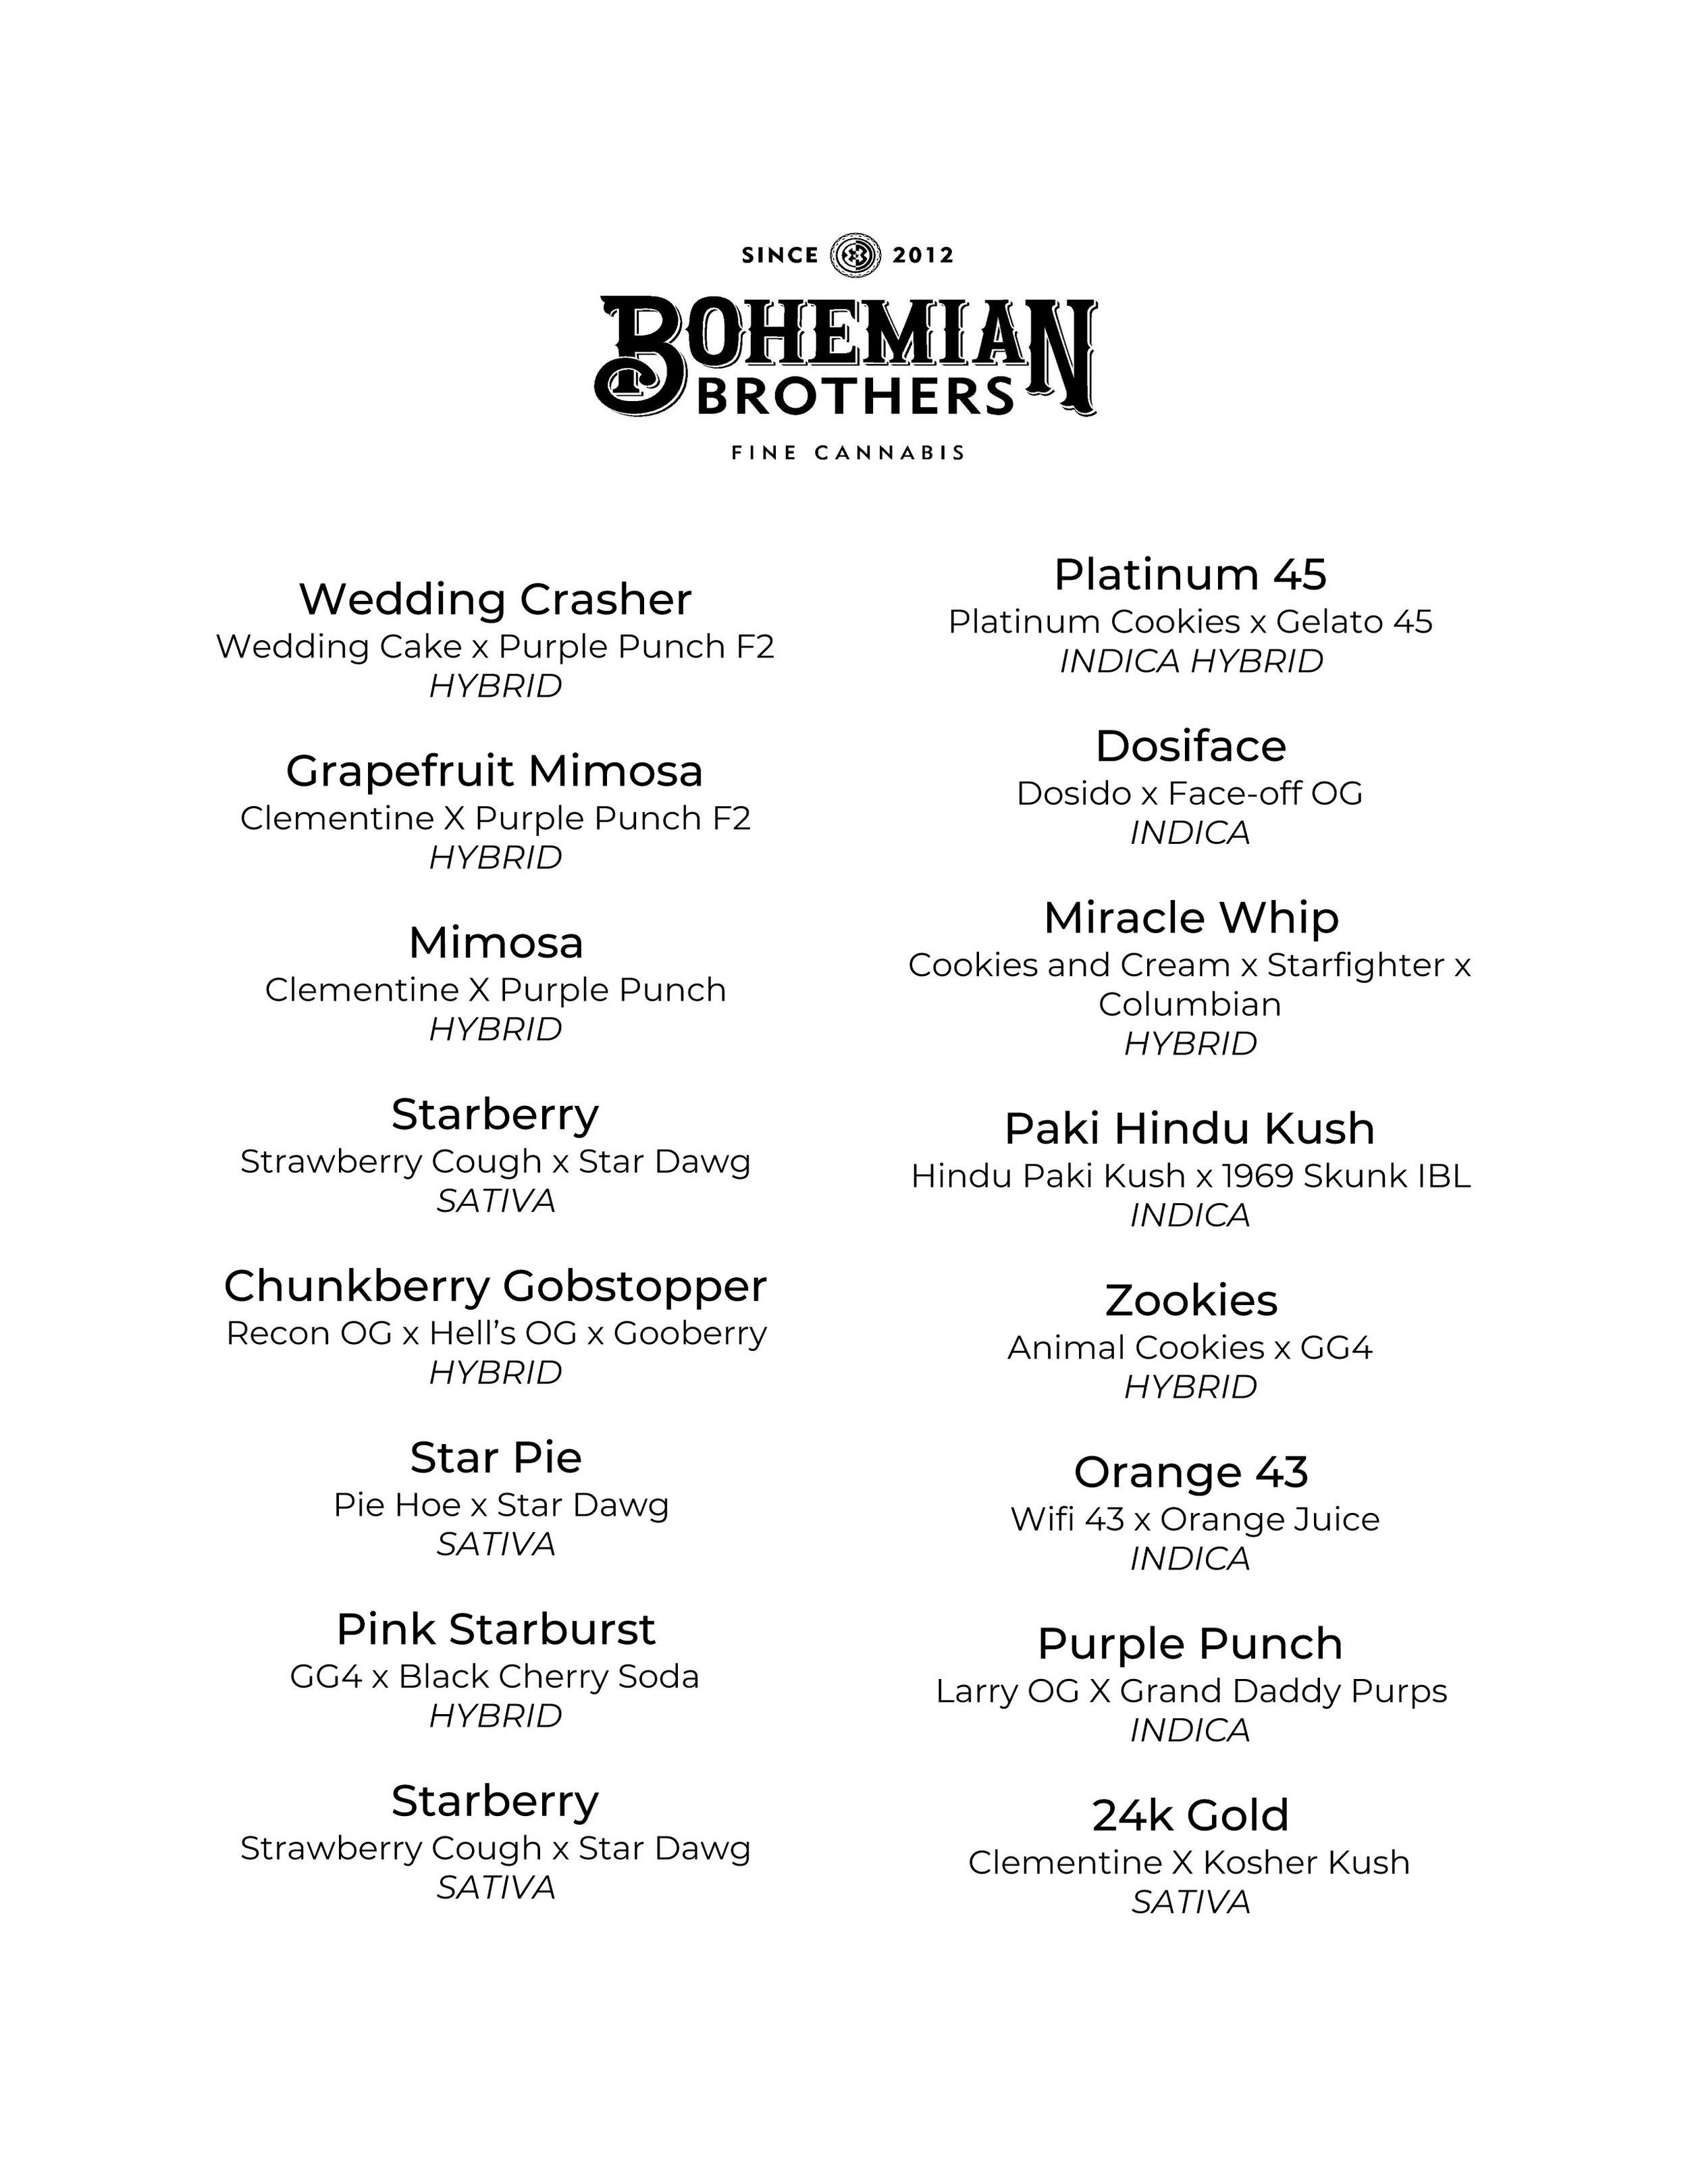 BohemianBrothers Strain List_5-1-19 copy.jpg